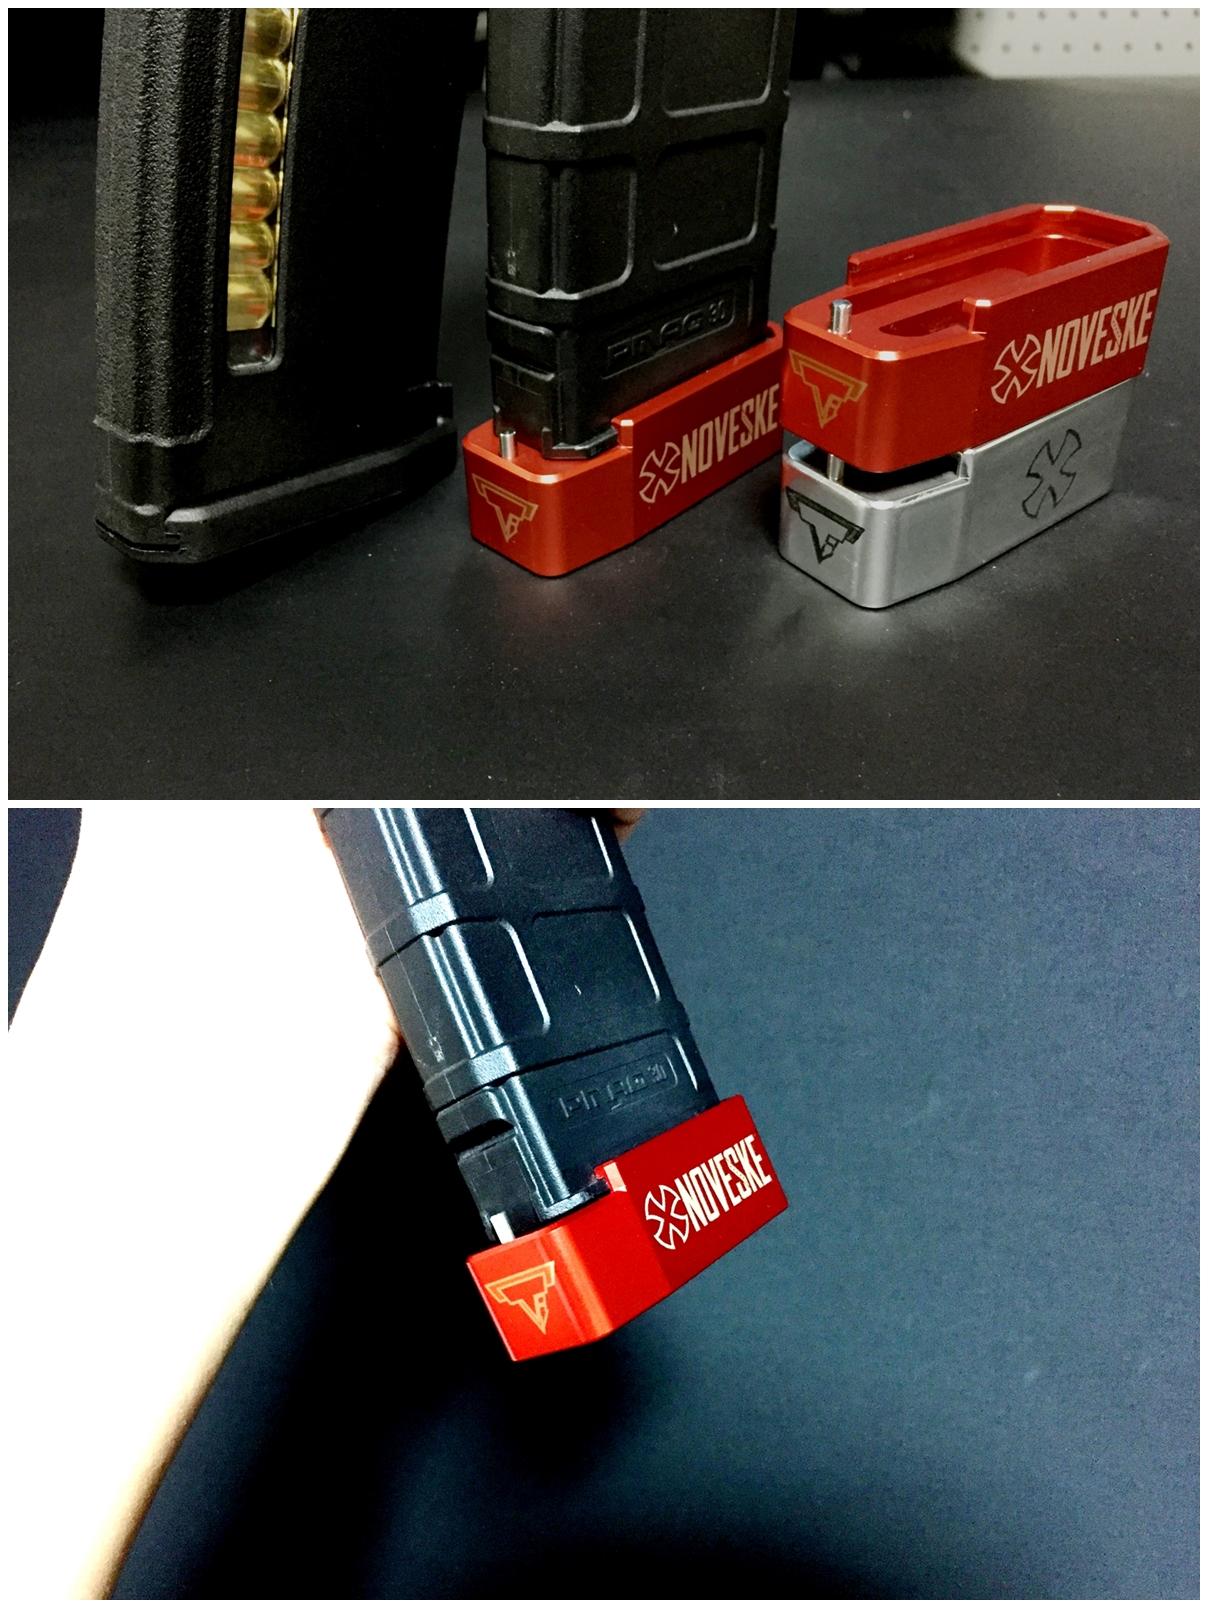 8 UAC P-MAG TTI TYPE アルミ ベース パッド 追加 購入 & TTI NOVESKE DIY LASER 刻印 加工 取付 レビュー